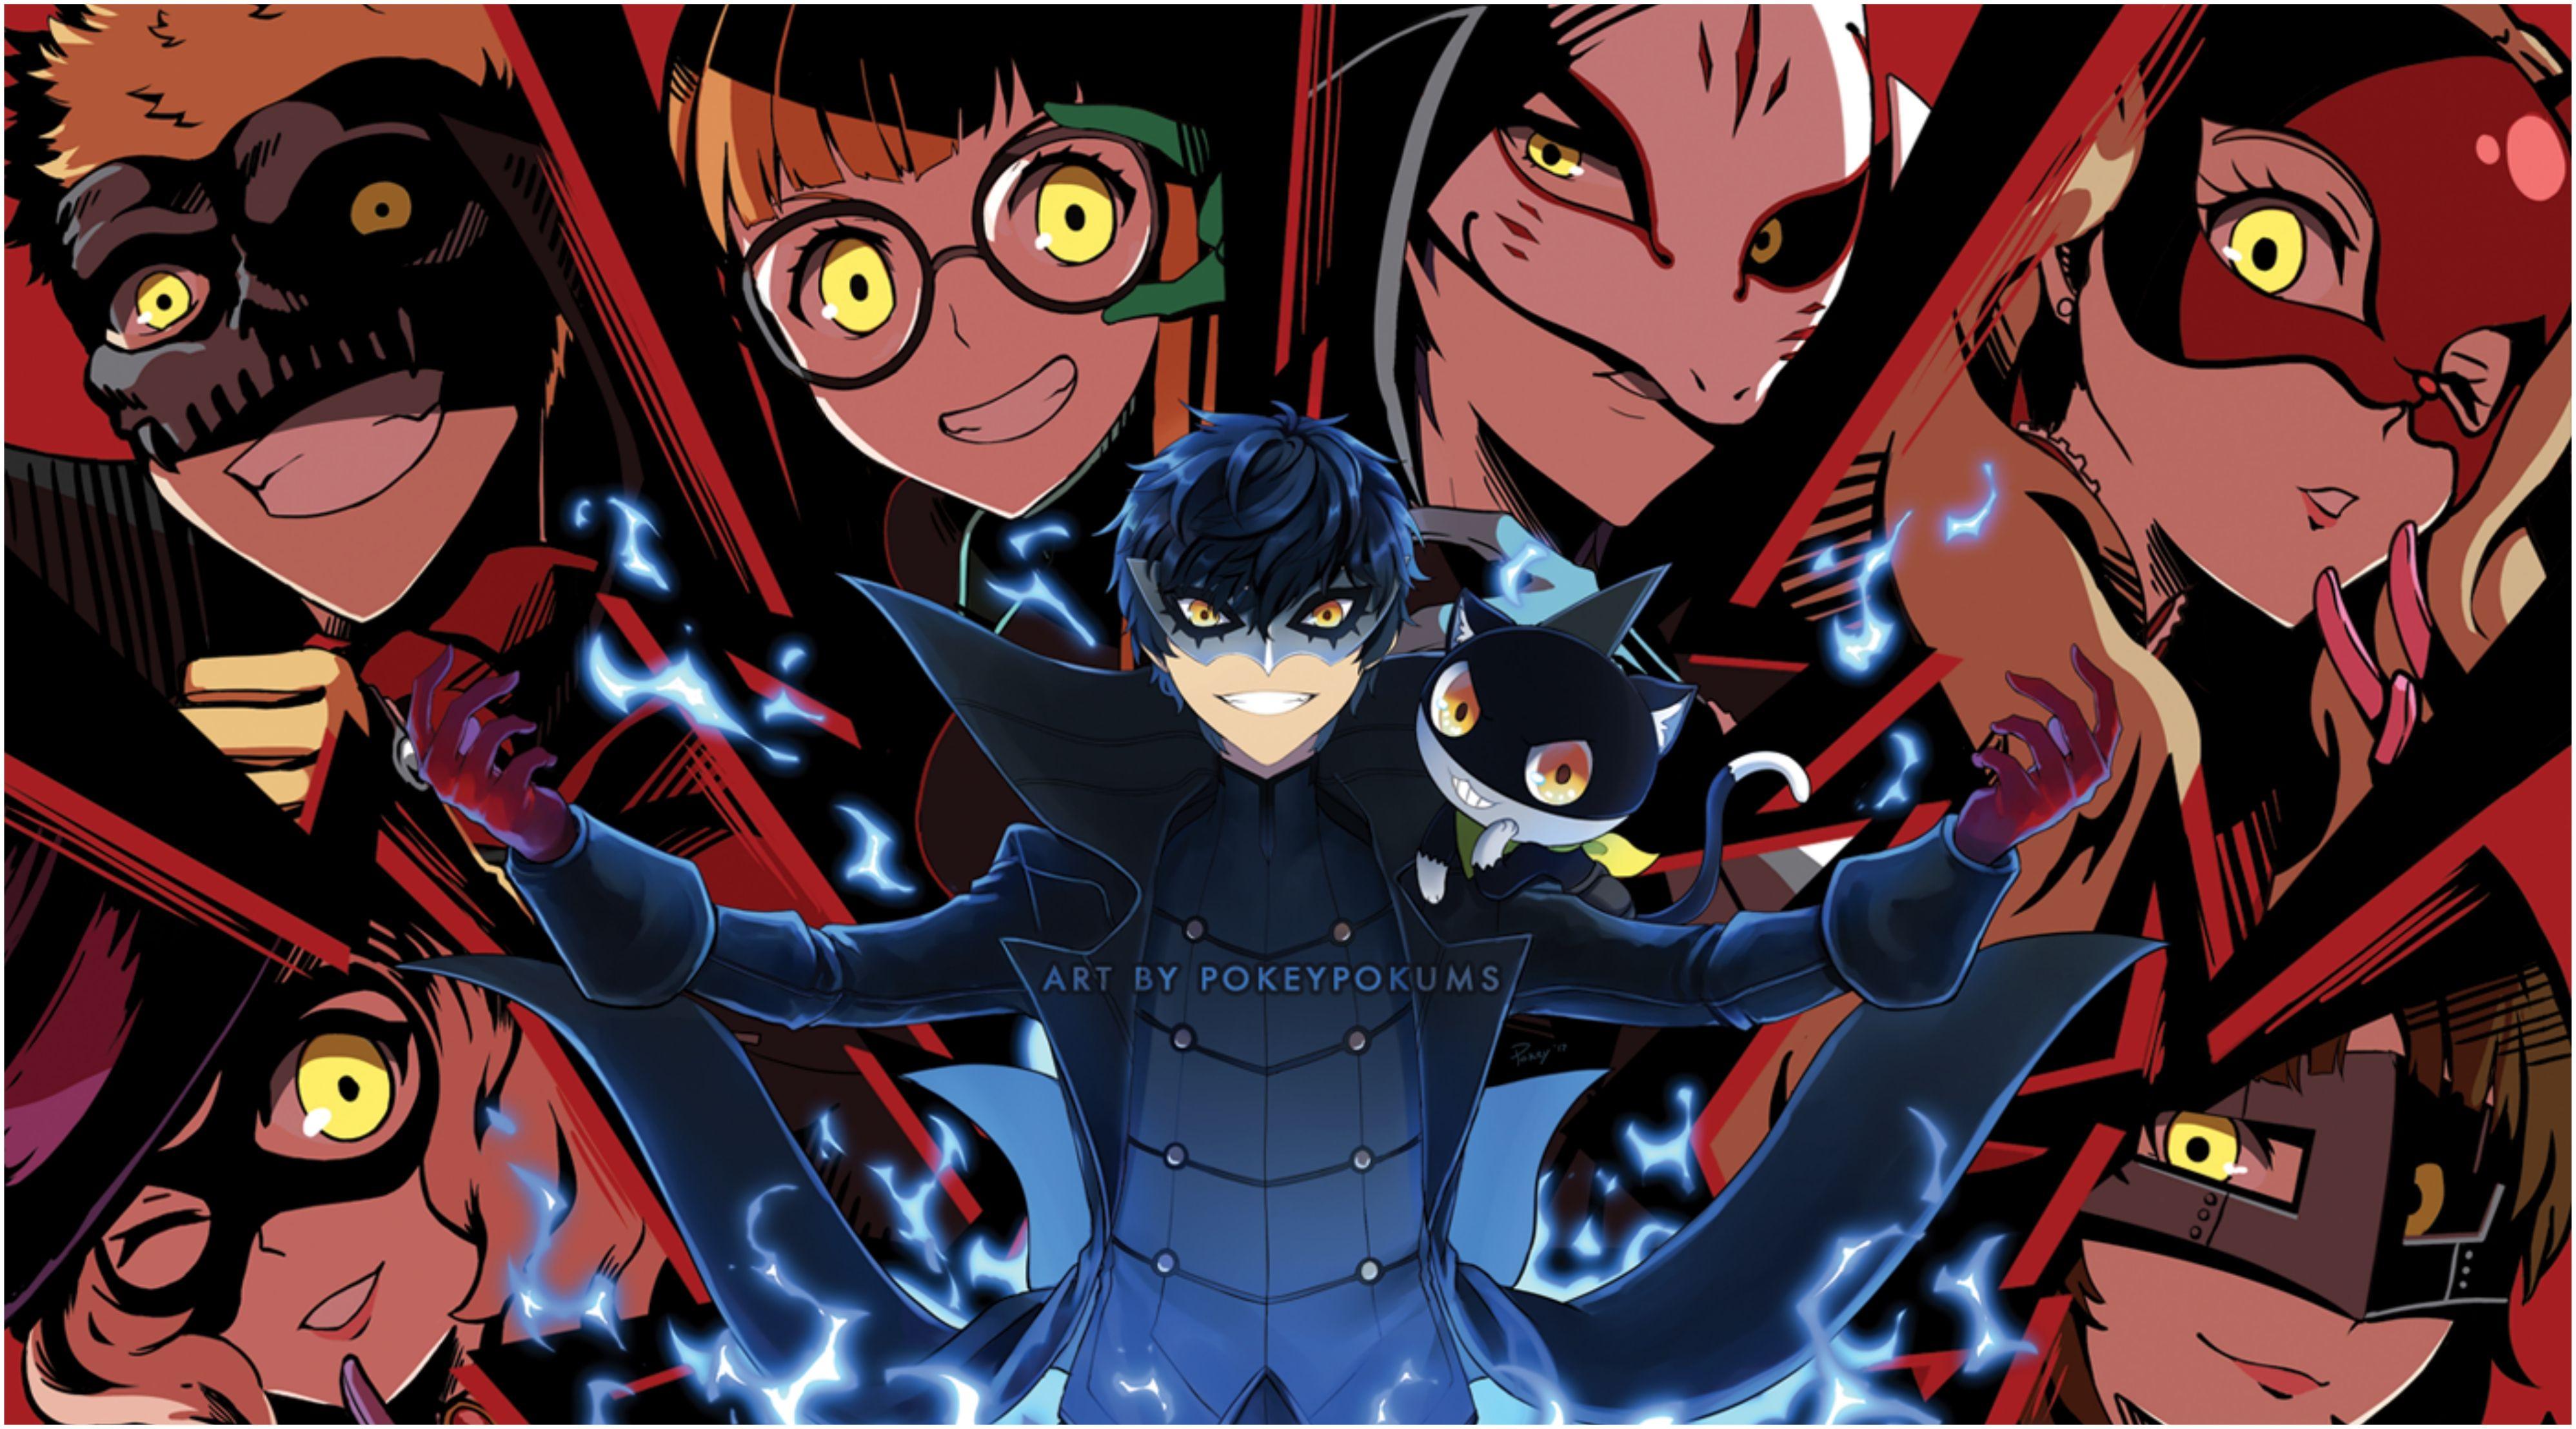 Persona 5 Wallpaper 4k 3994x2216 Anime Persona 5 Akira Kurusu